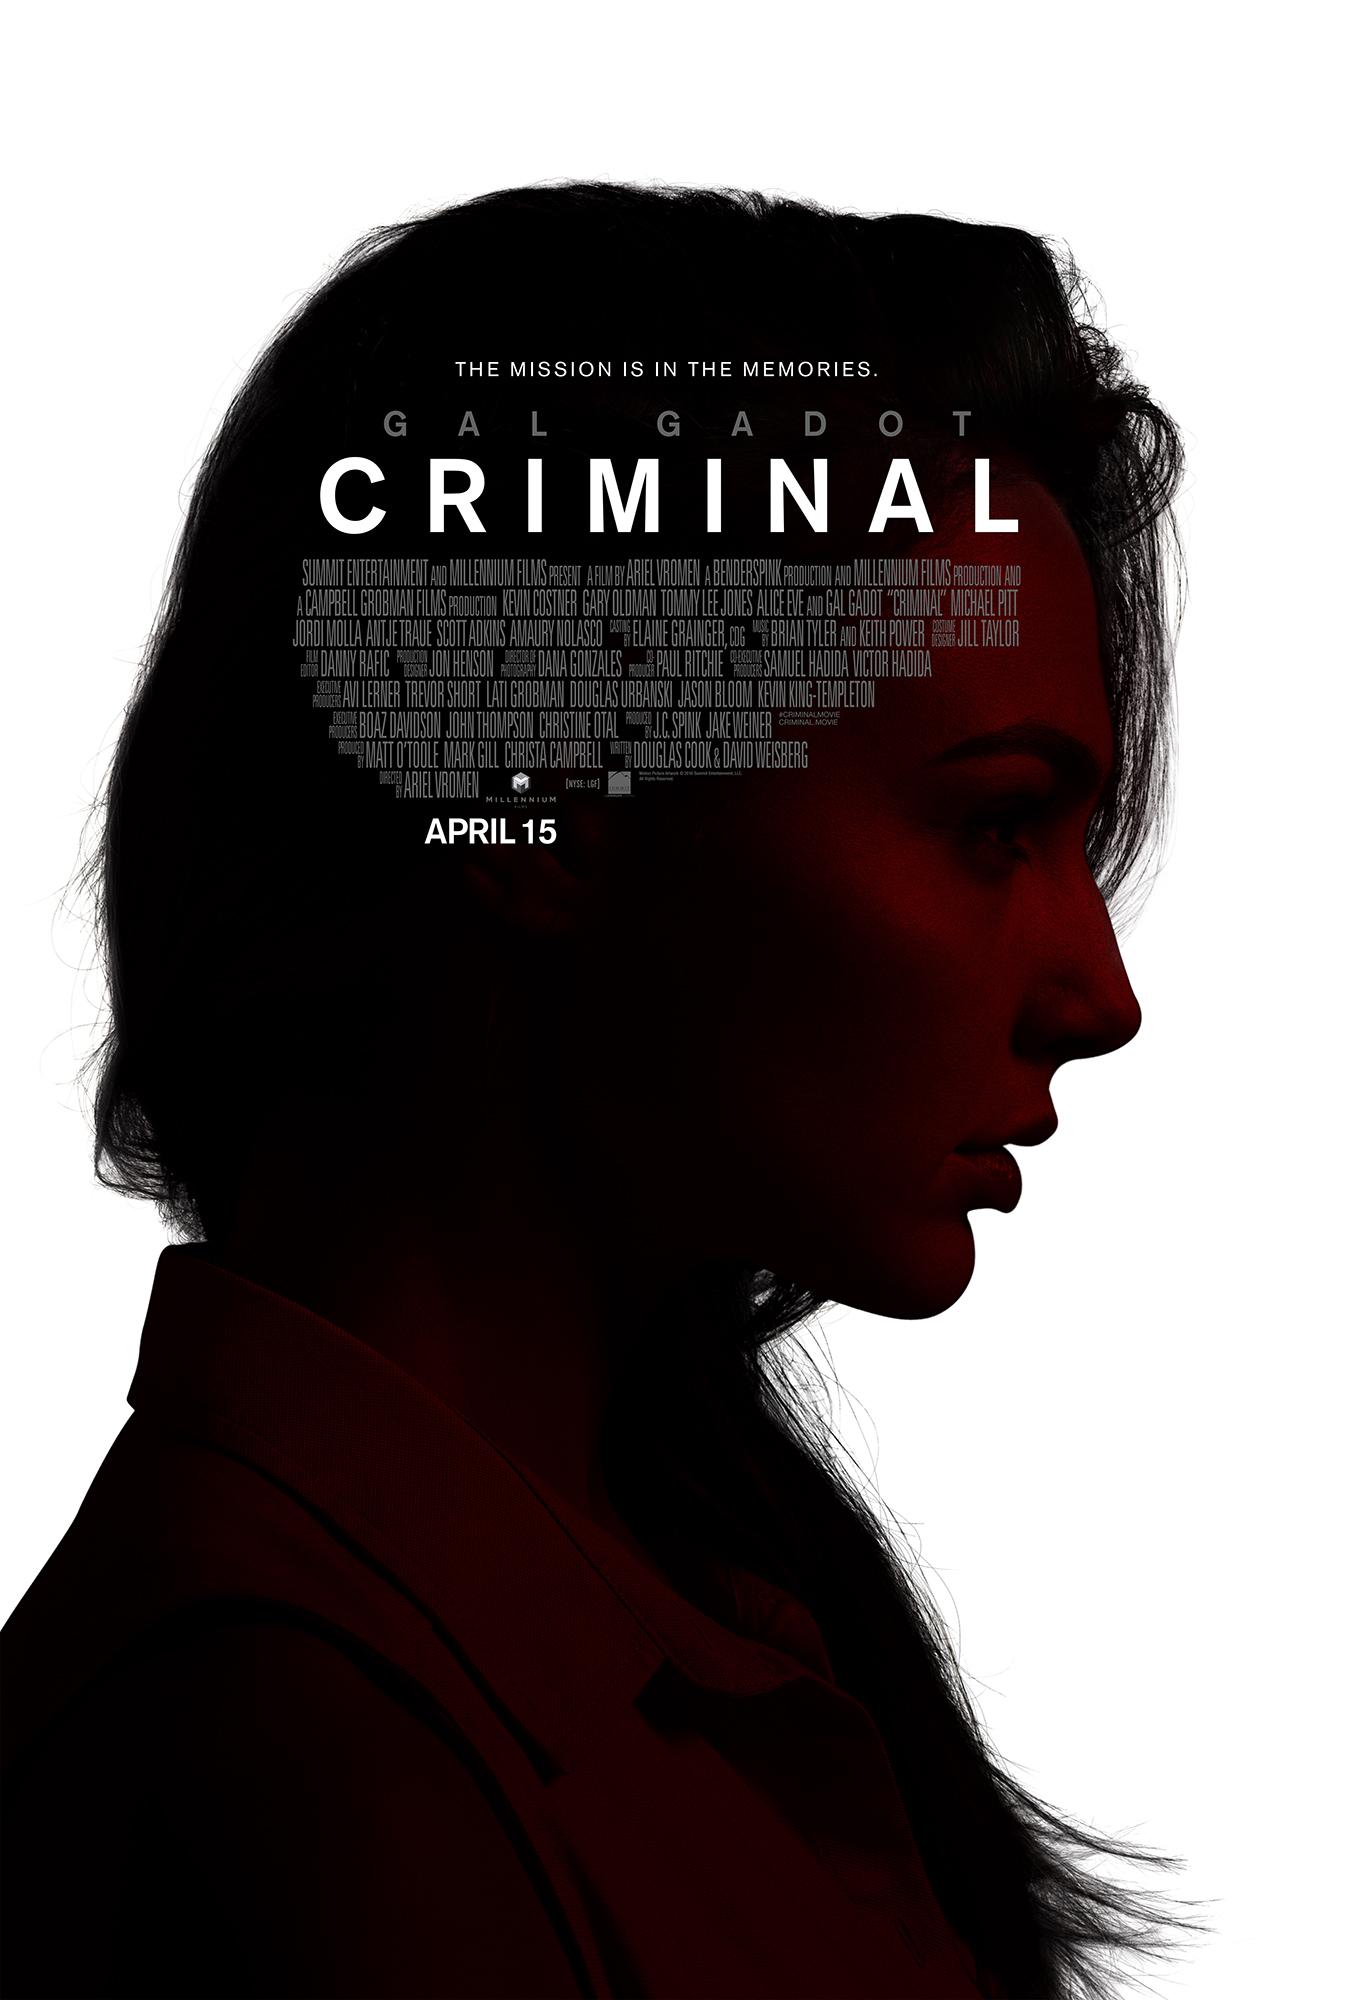 Criminal_Tsr_GG_Trim_100dpi.jpg